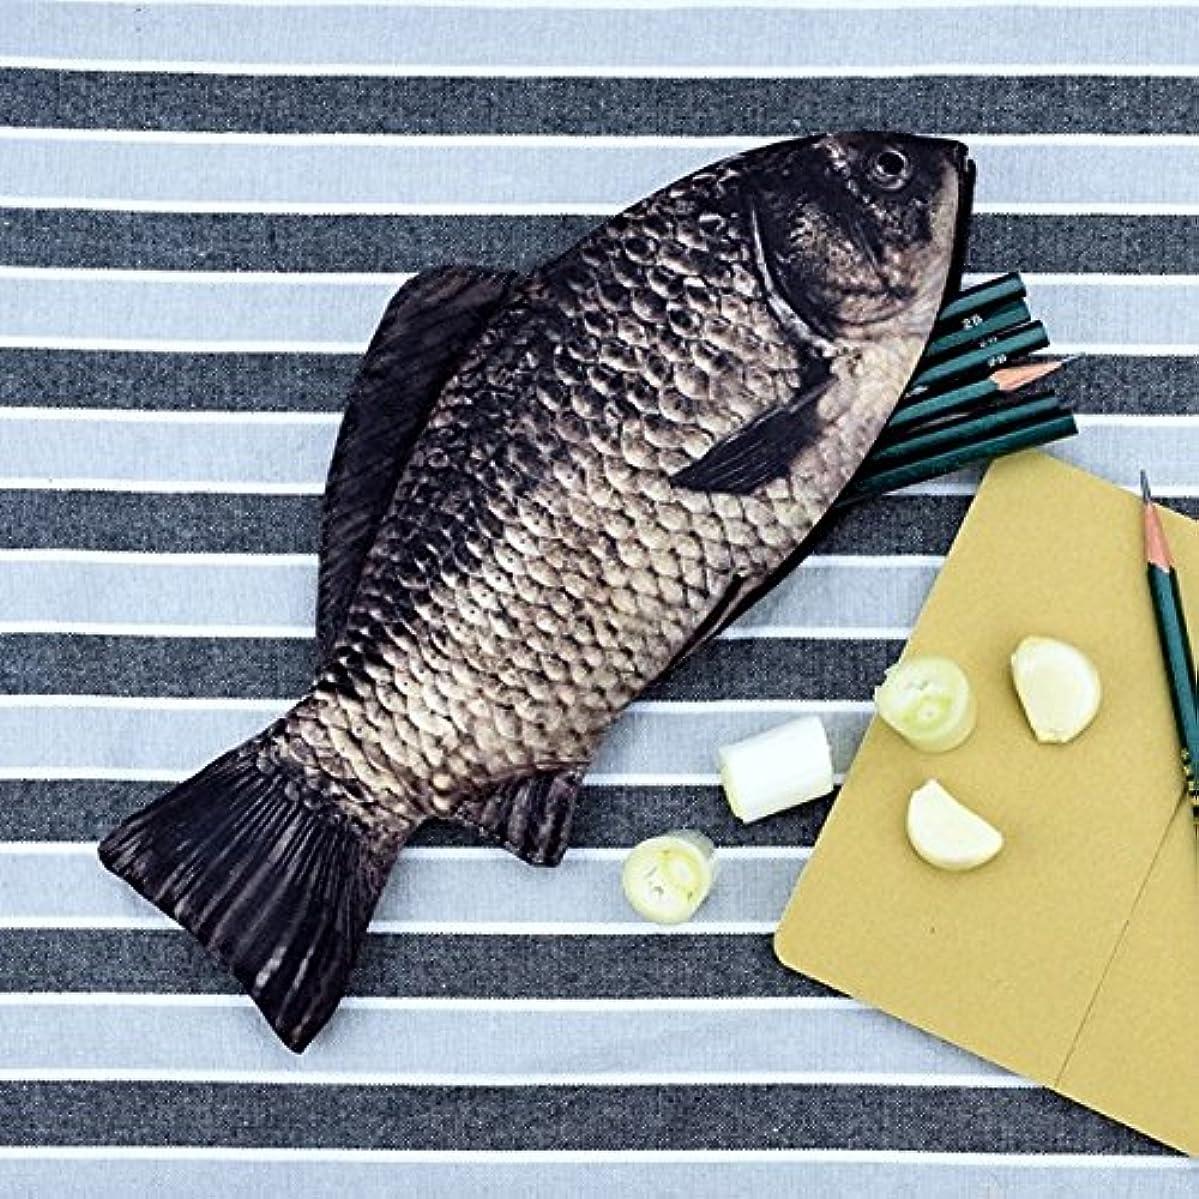 Fangfang Creative Pen Bag Carp Fish Shape Penceil Case Zip Wallet